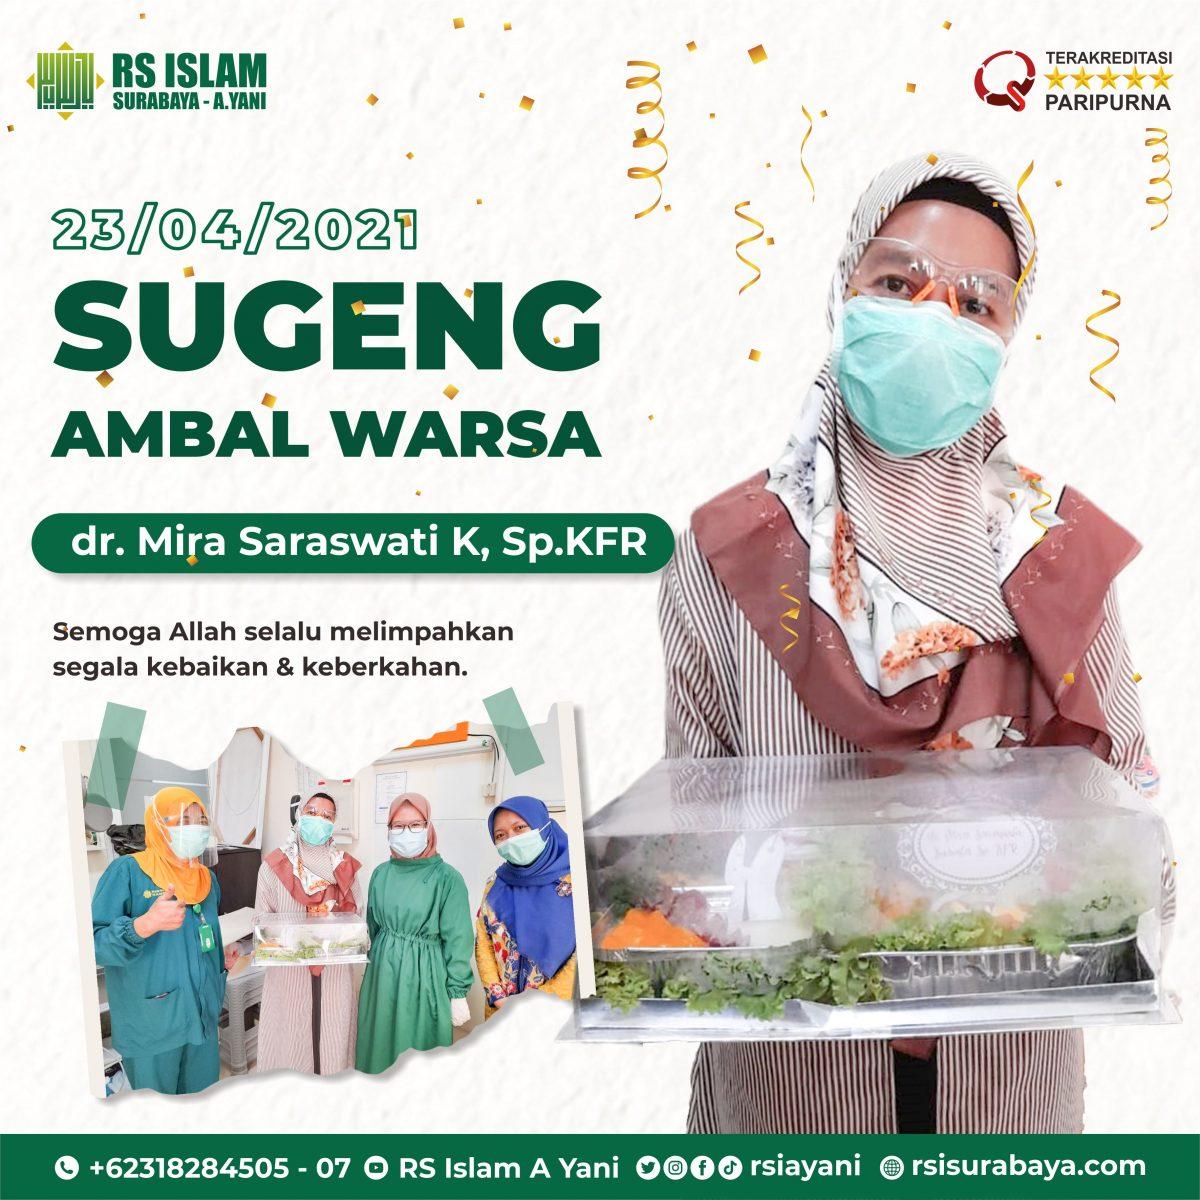 dr.-Mira-Saraswati-K-Sp.KFR-tgl-23-April-2021-1200x1200.jpg